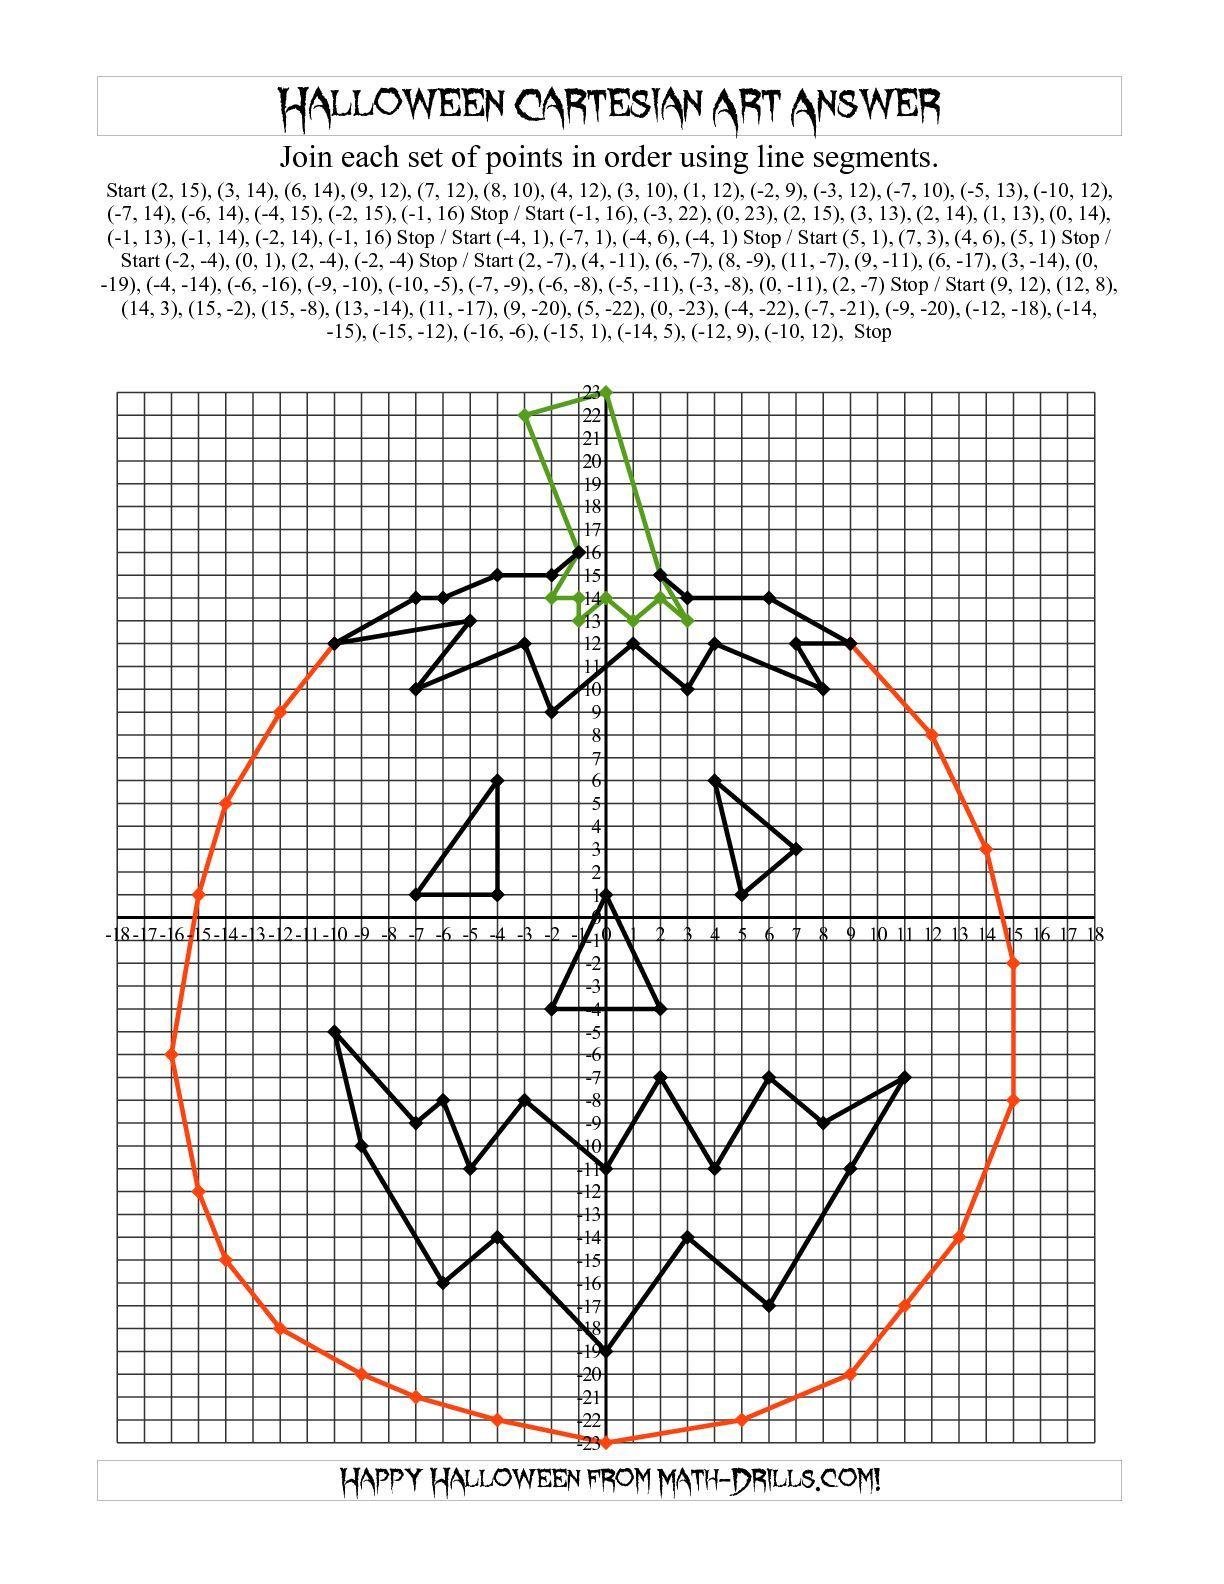 worksheet Halloween Math Worksheets Middle School the cartesian art halloween jack o lantern math worksheet from worksheets